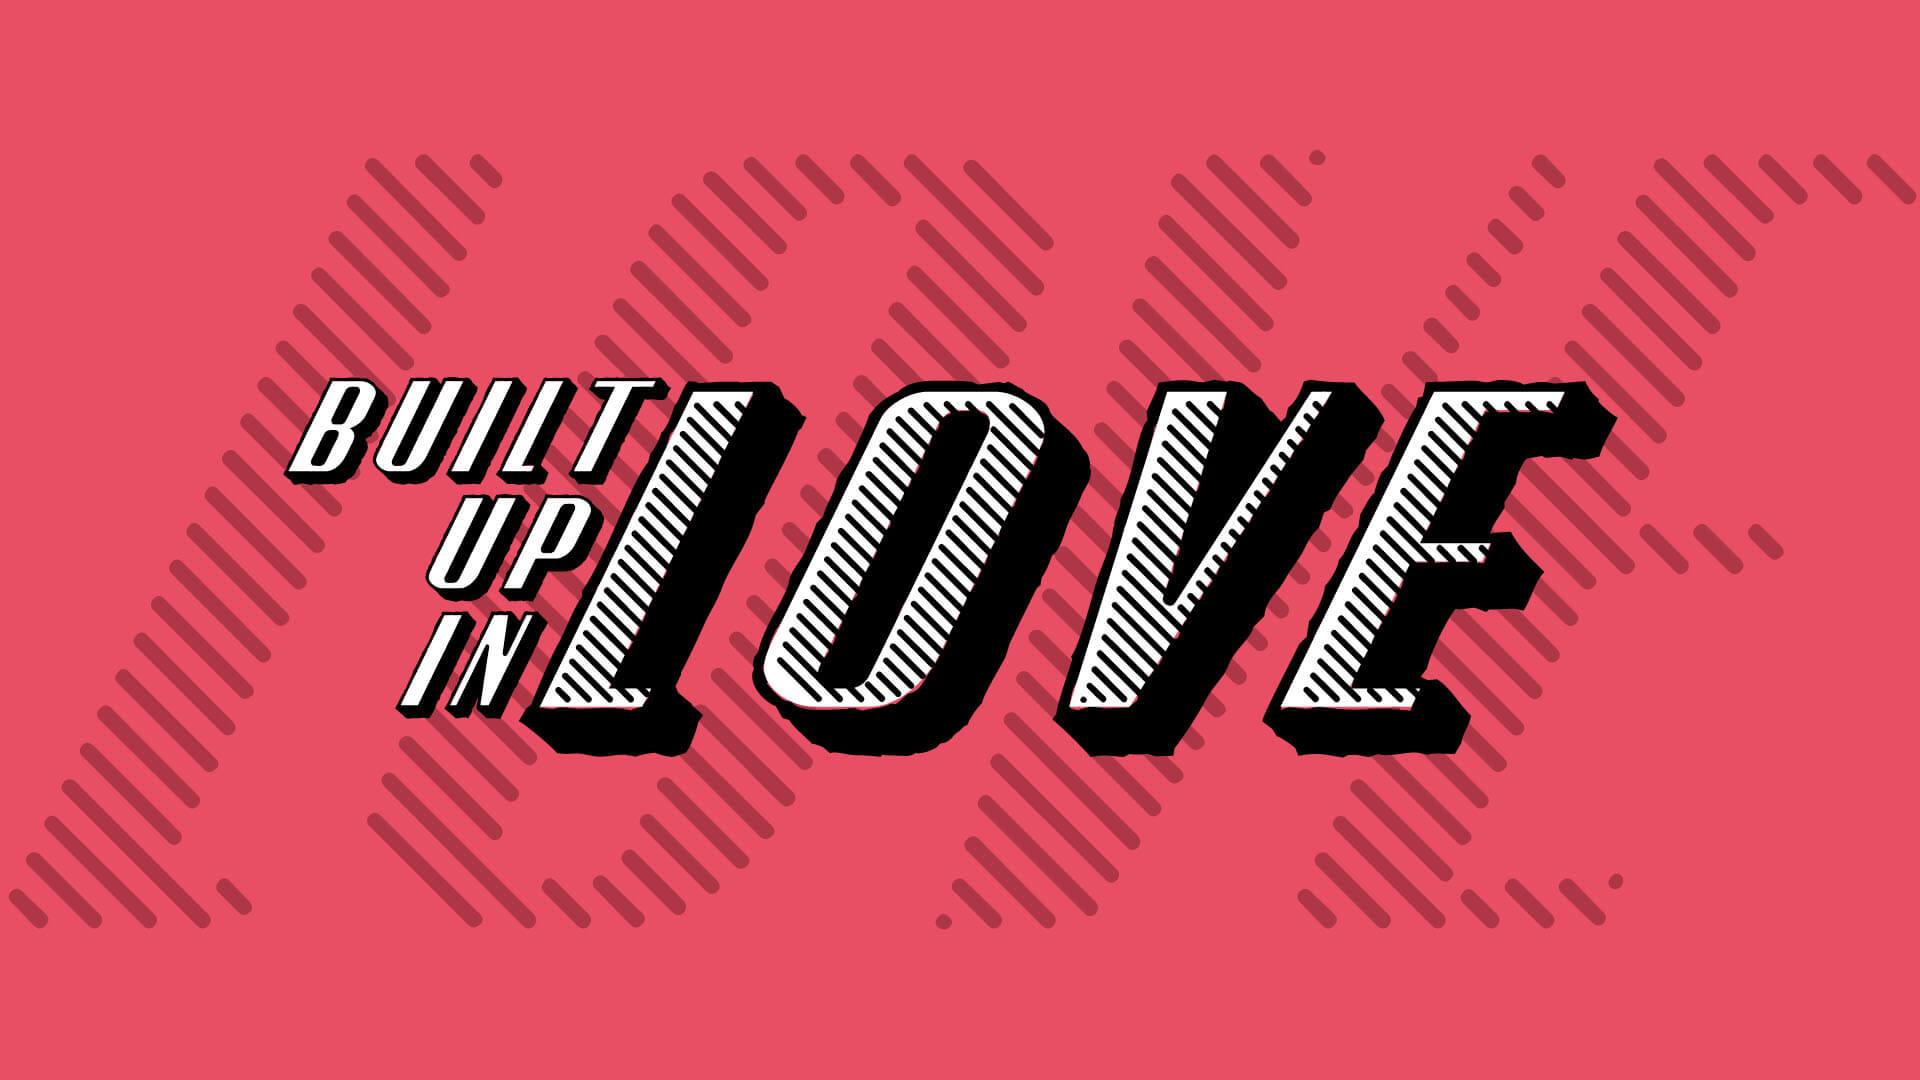 Built Up In Love - 1920x1080.jpg